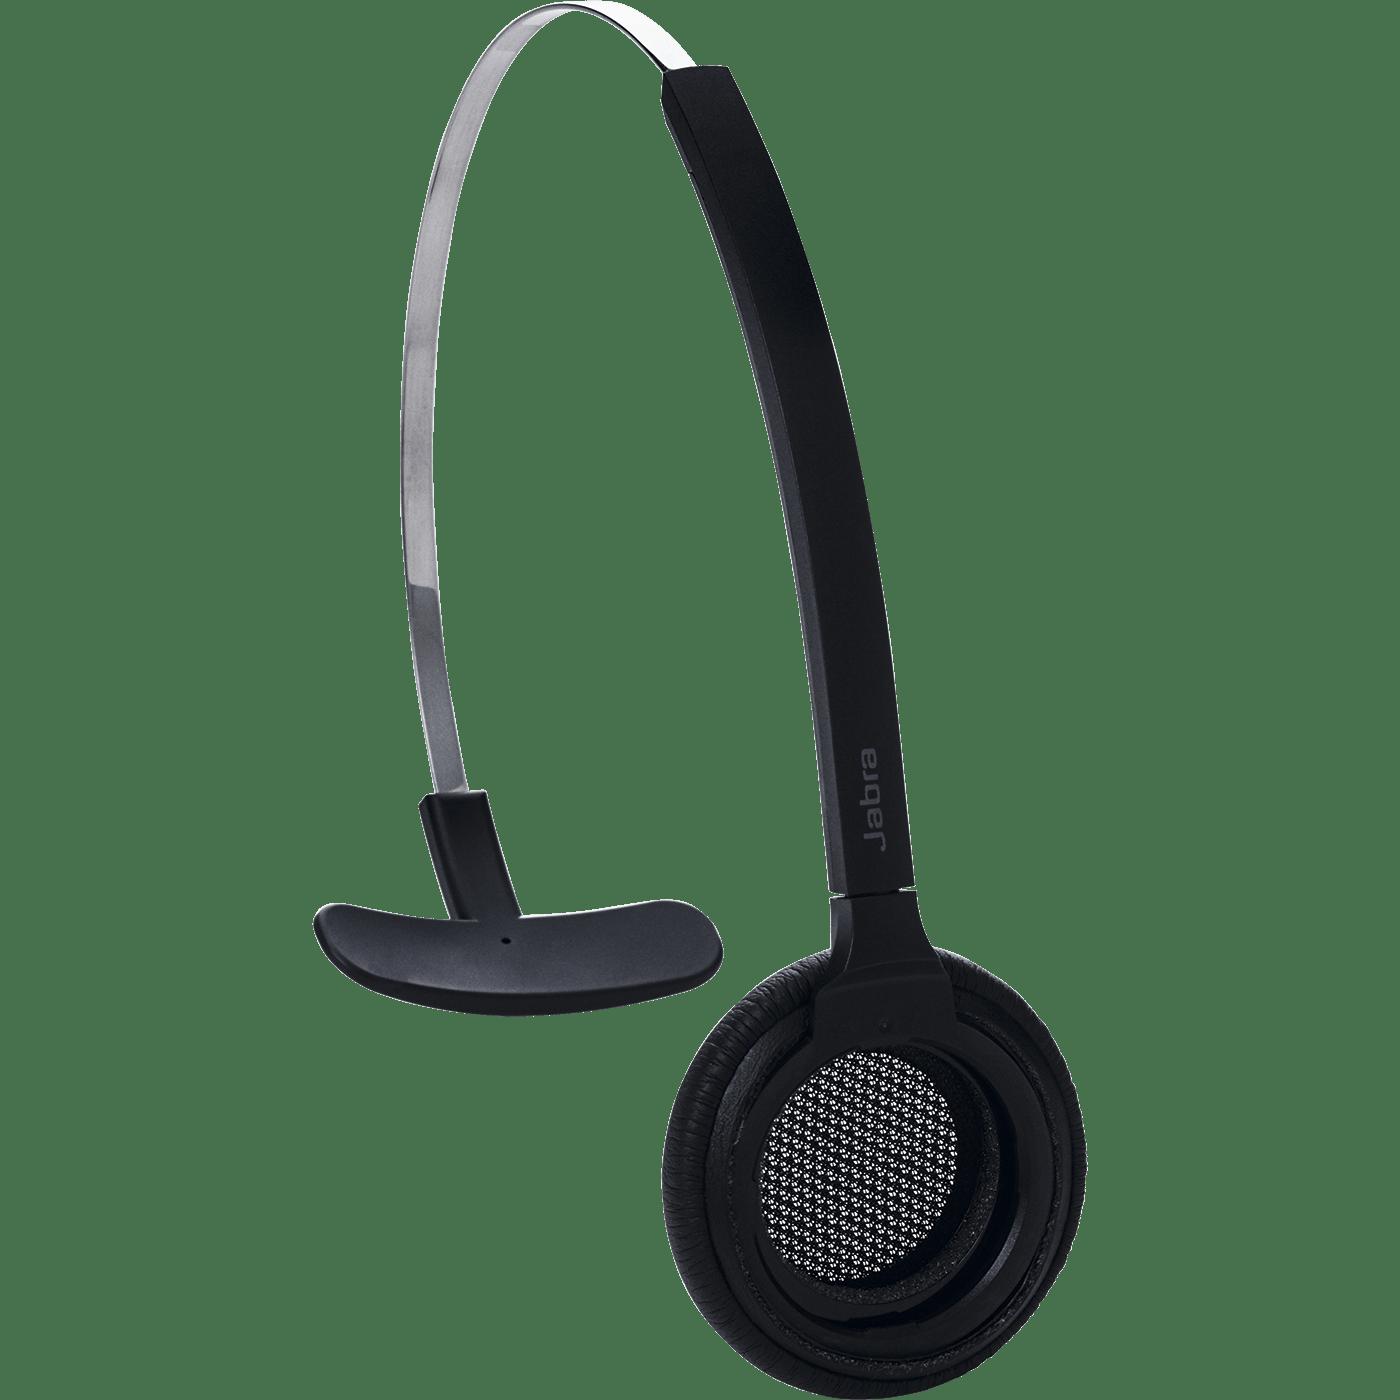 Jabra Pro9400 Headband